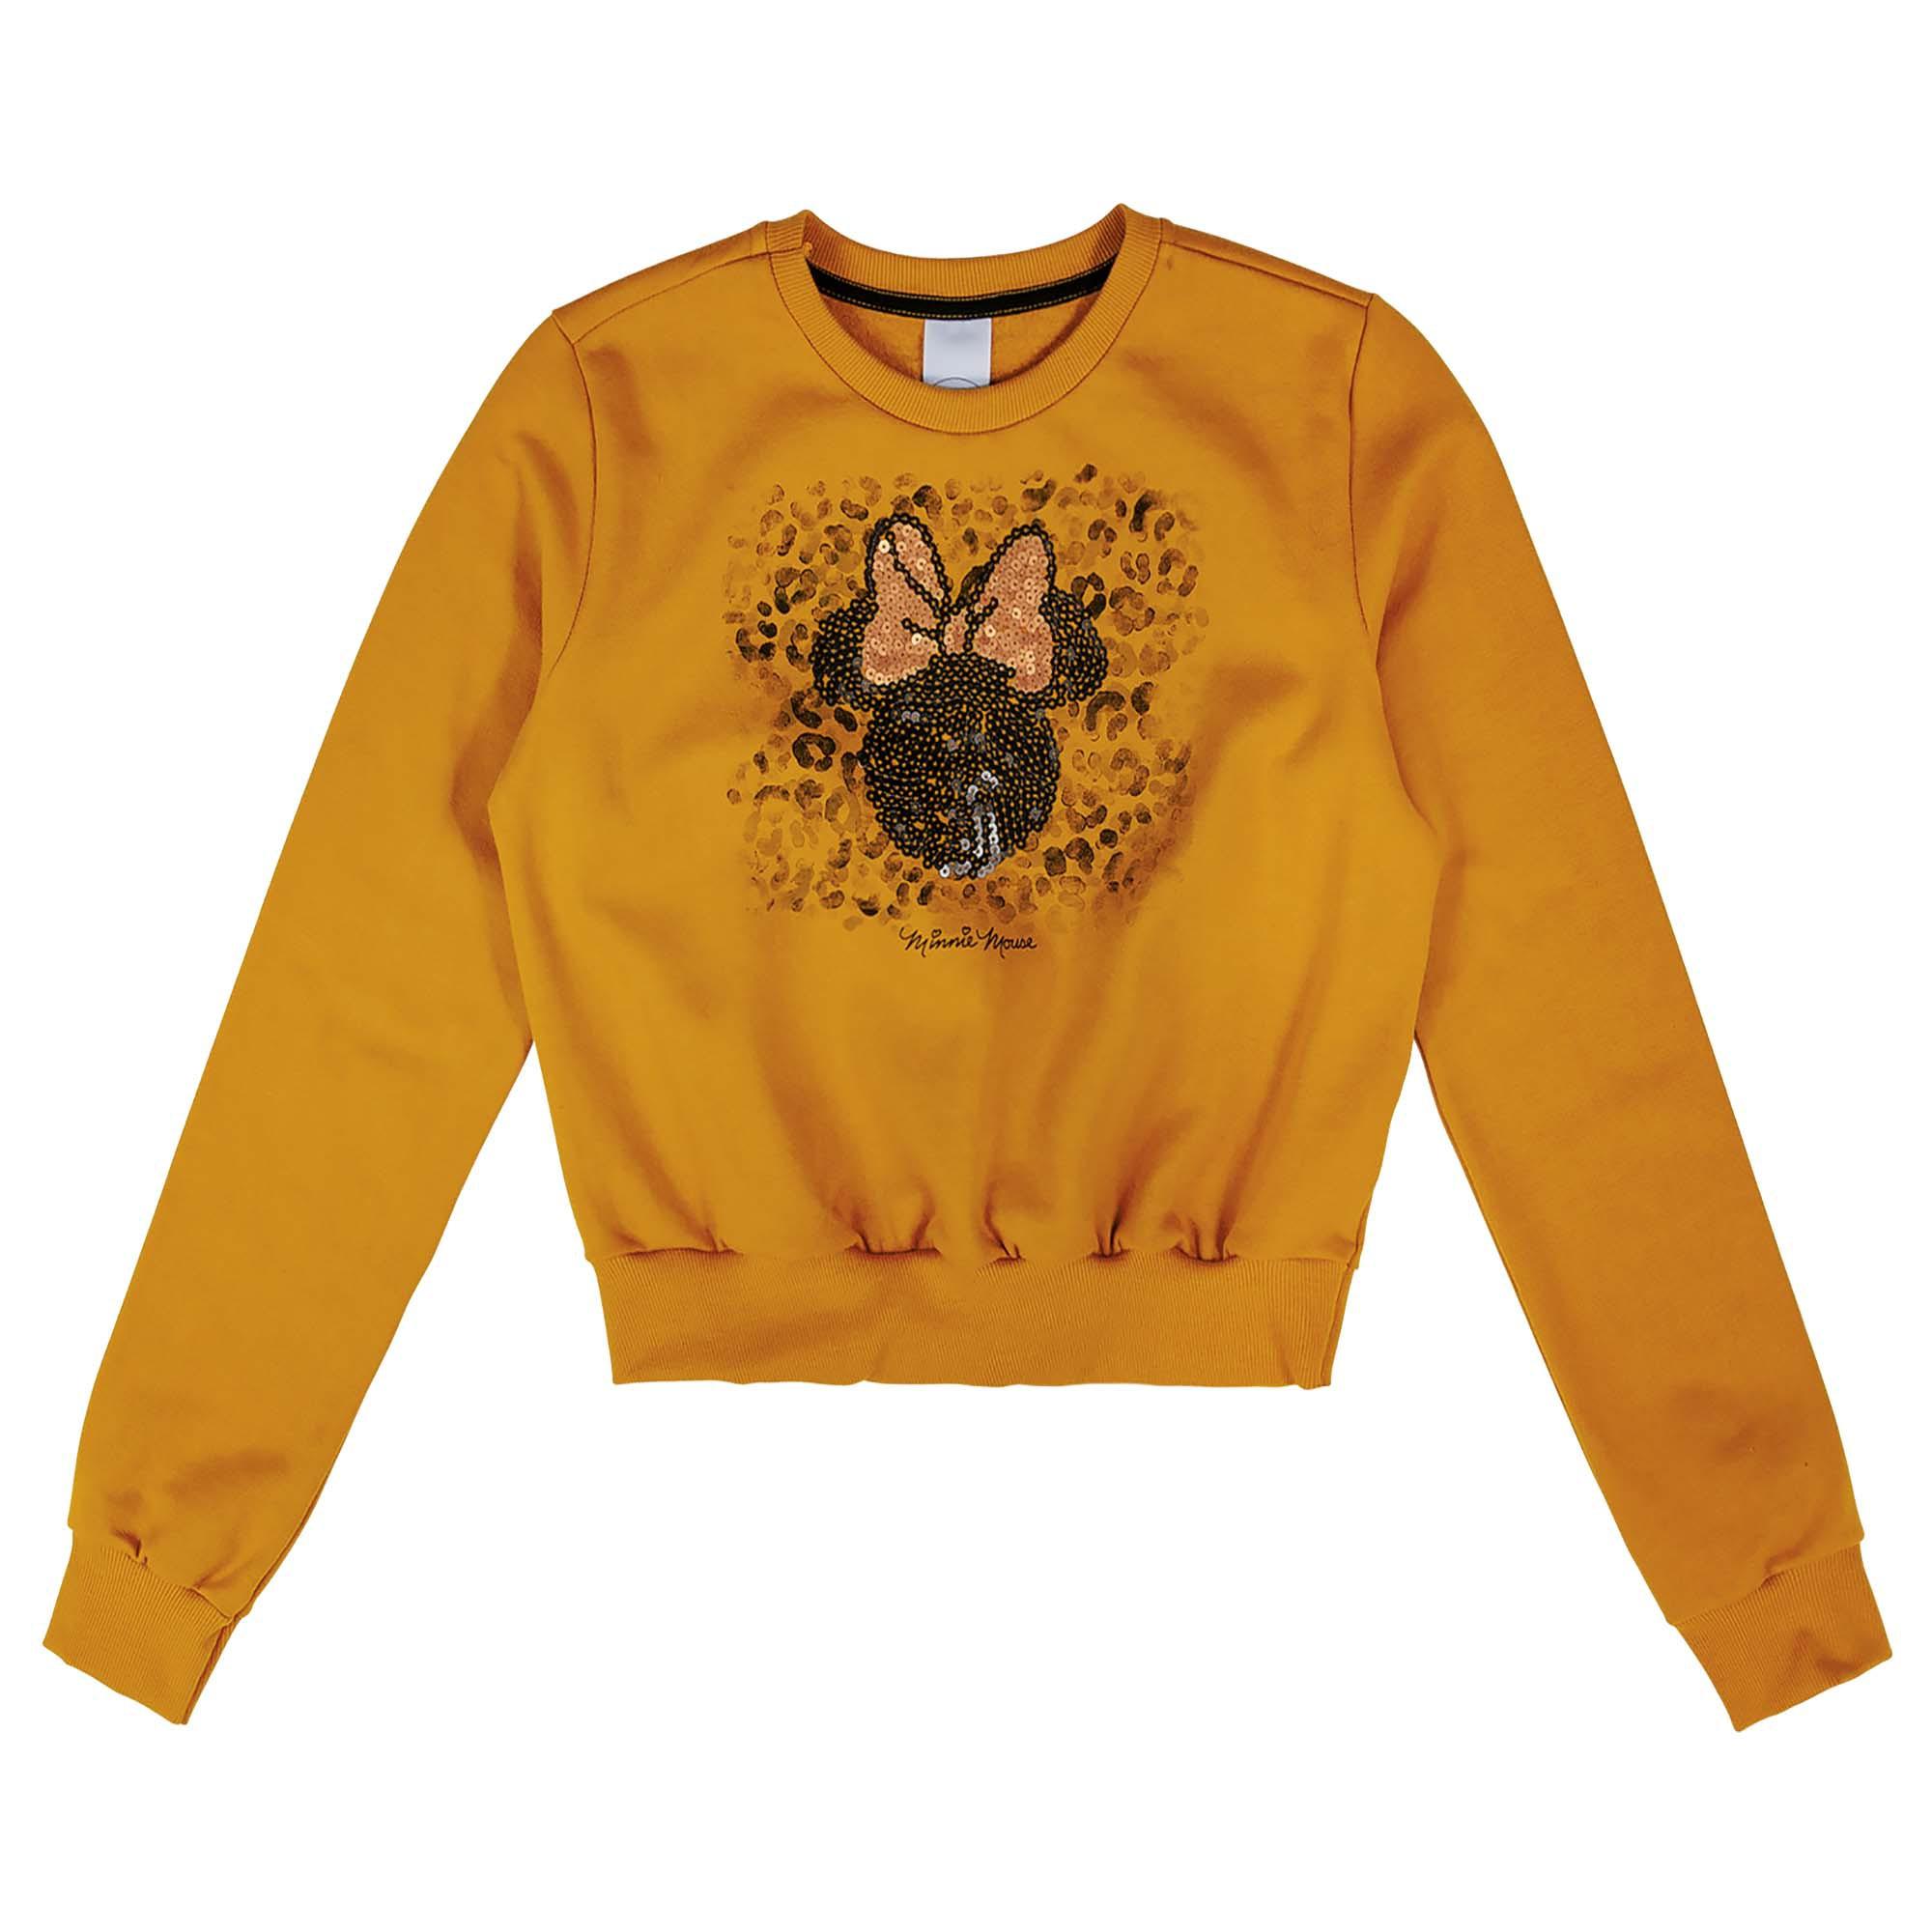 Blusão Cativa Estampa Bordado Lantejoula Mickey e Minnie - 10 ao 16